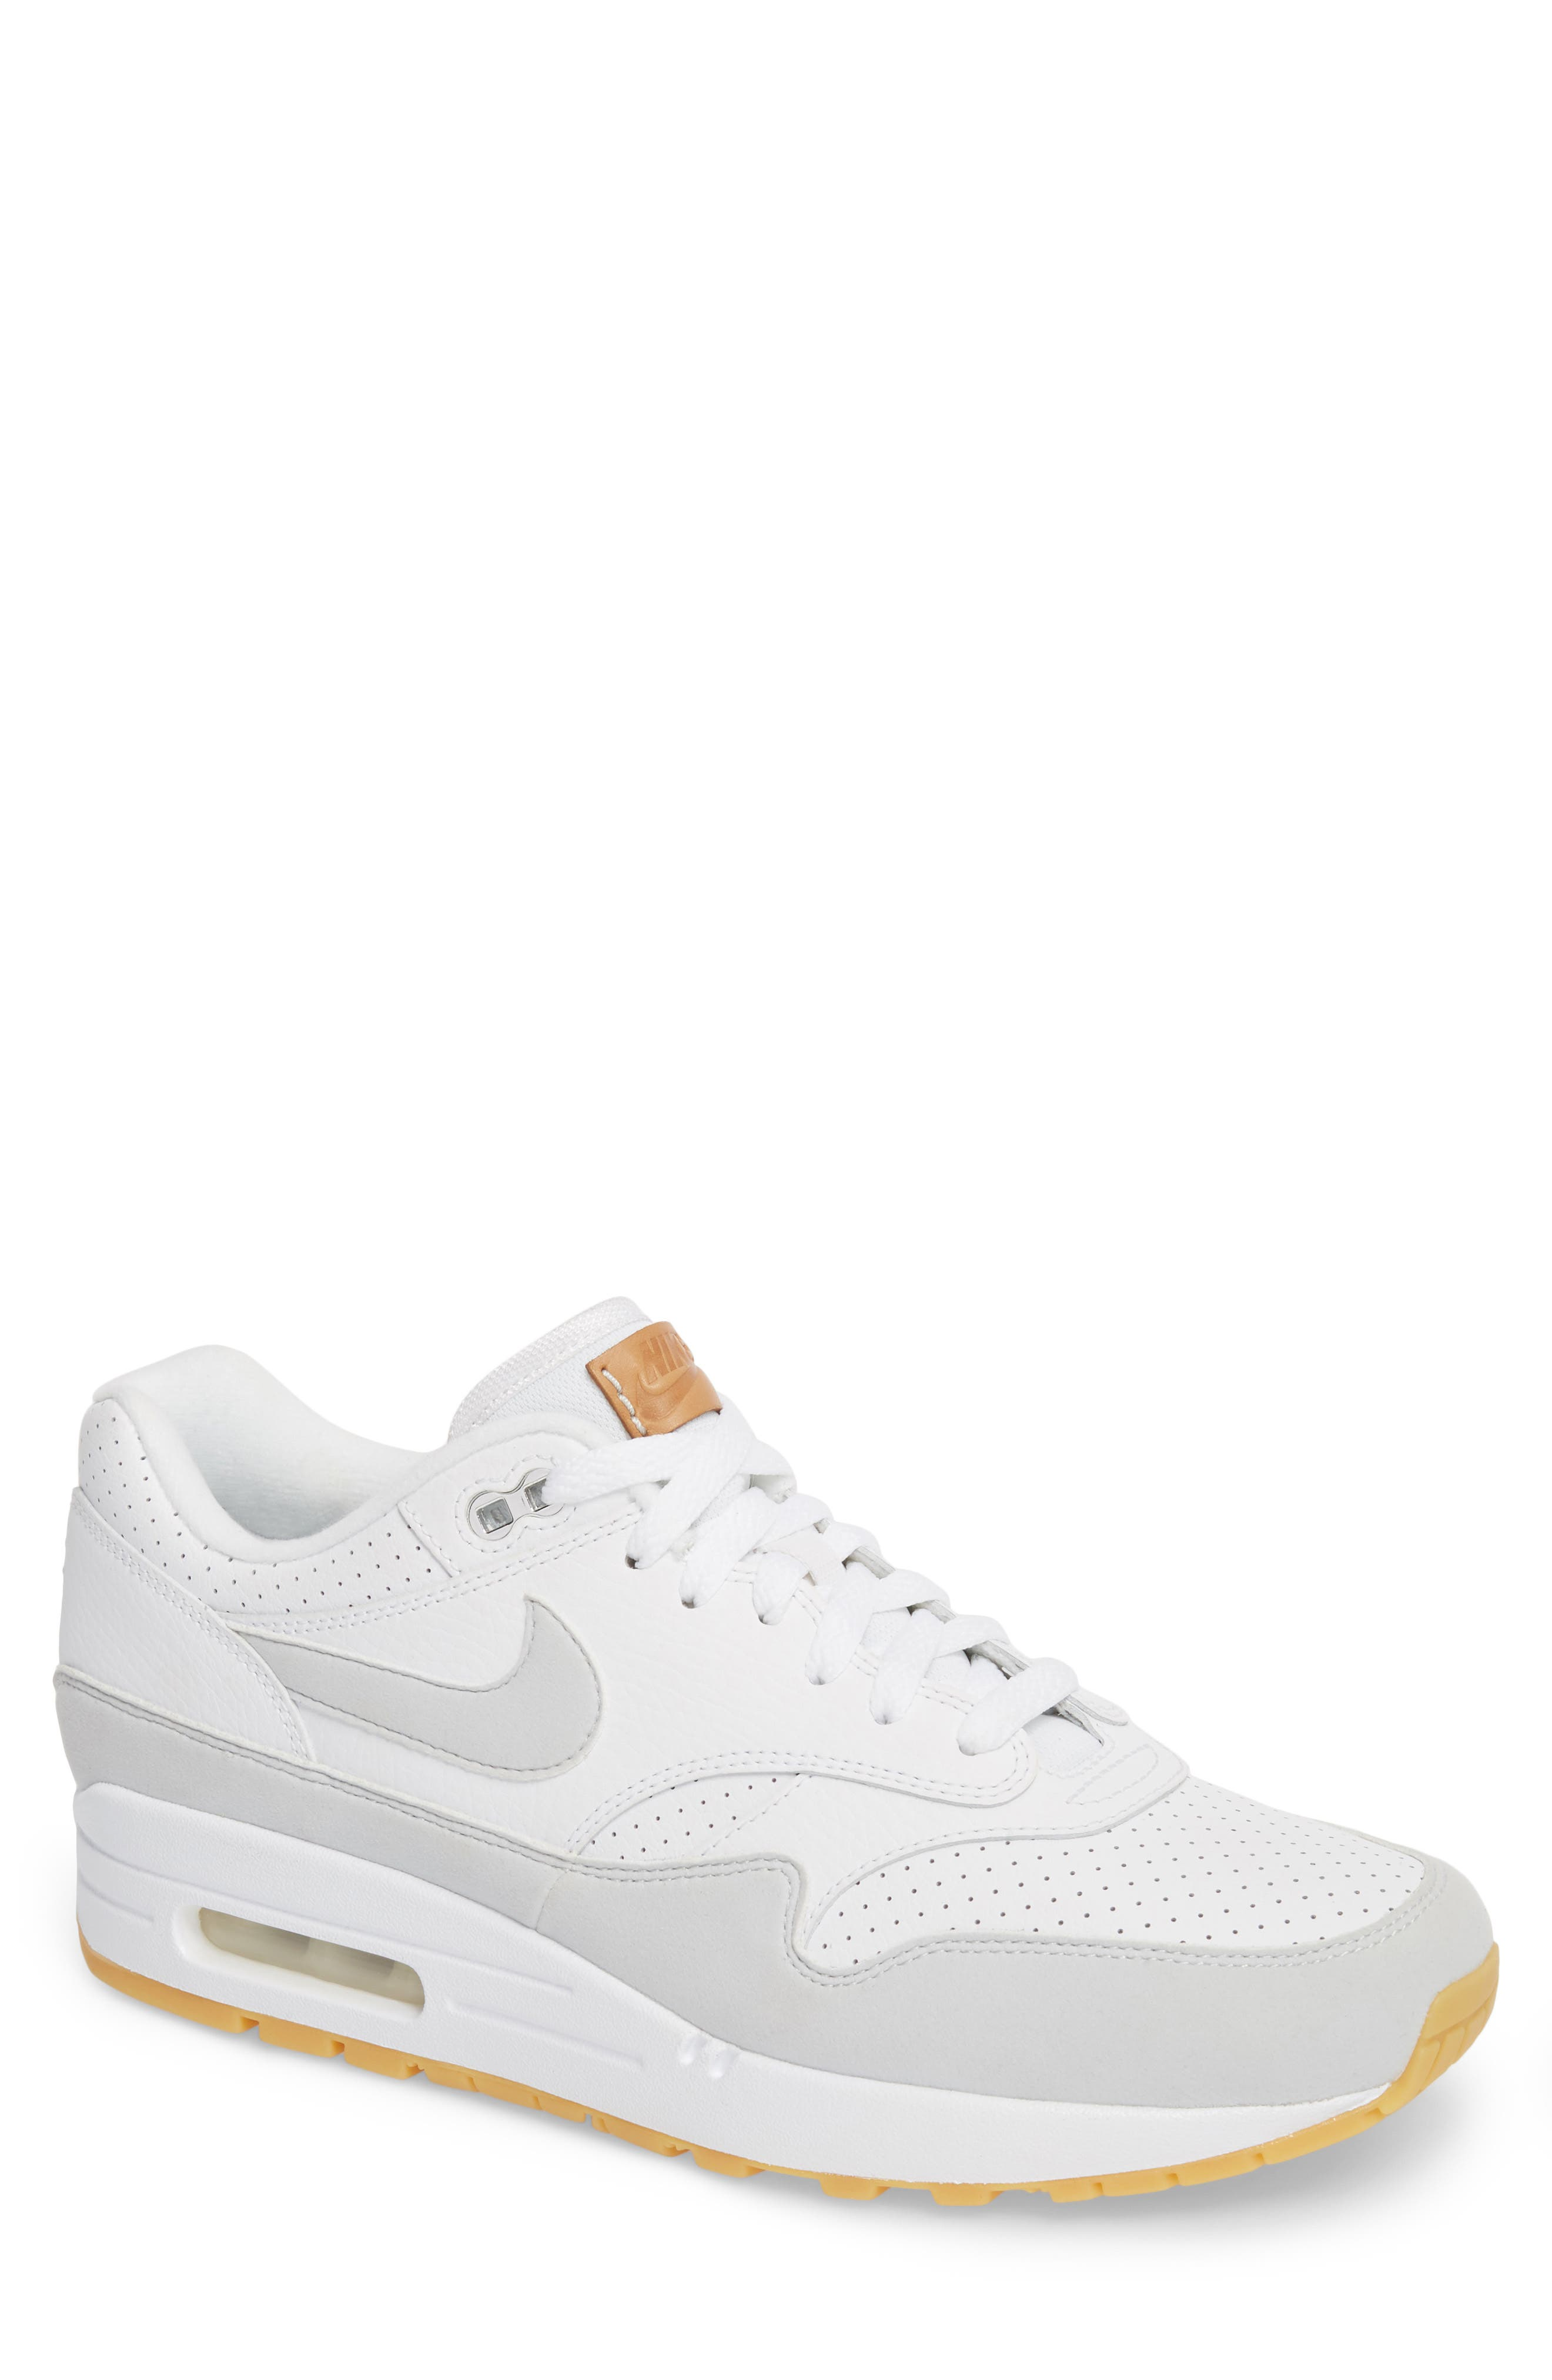 Air Max 1 Sneaker,                         Main,                         color, White/ Pure Platinum/ Yellow